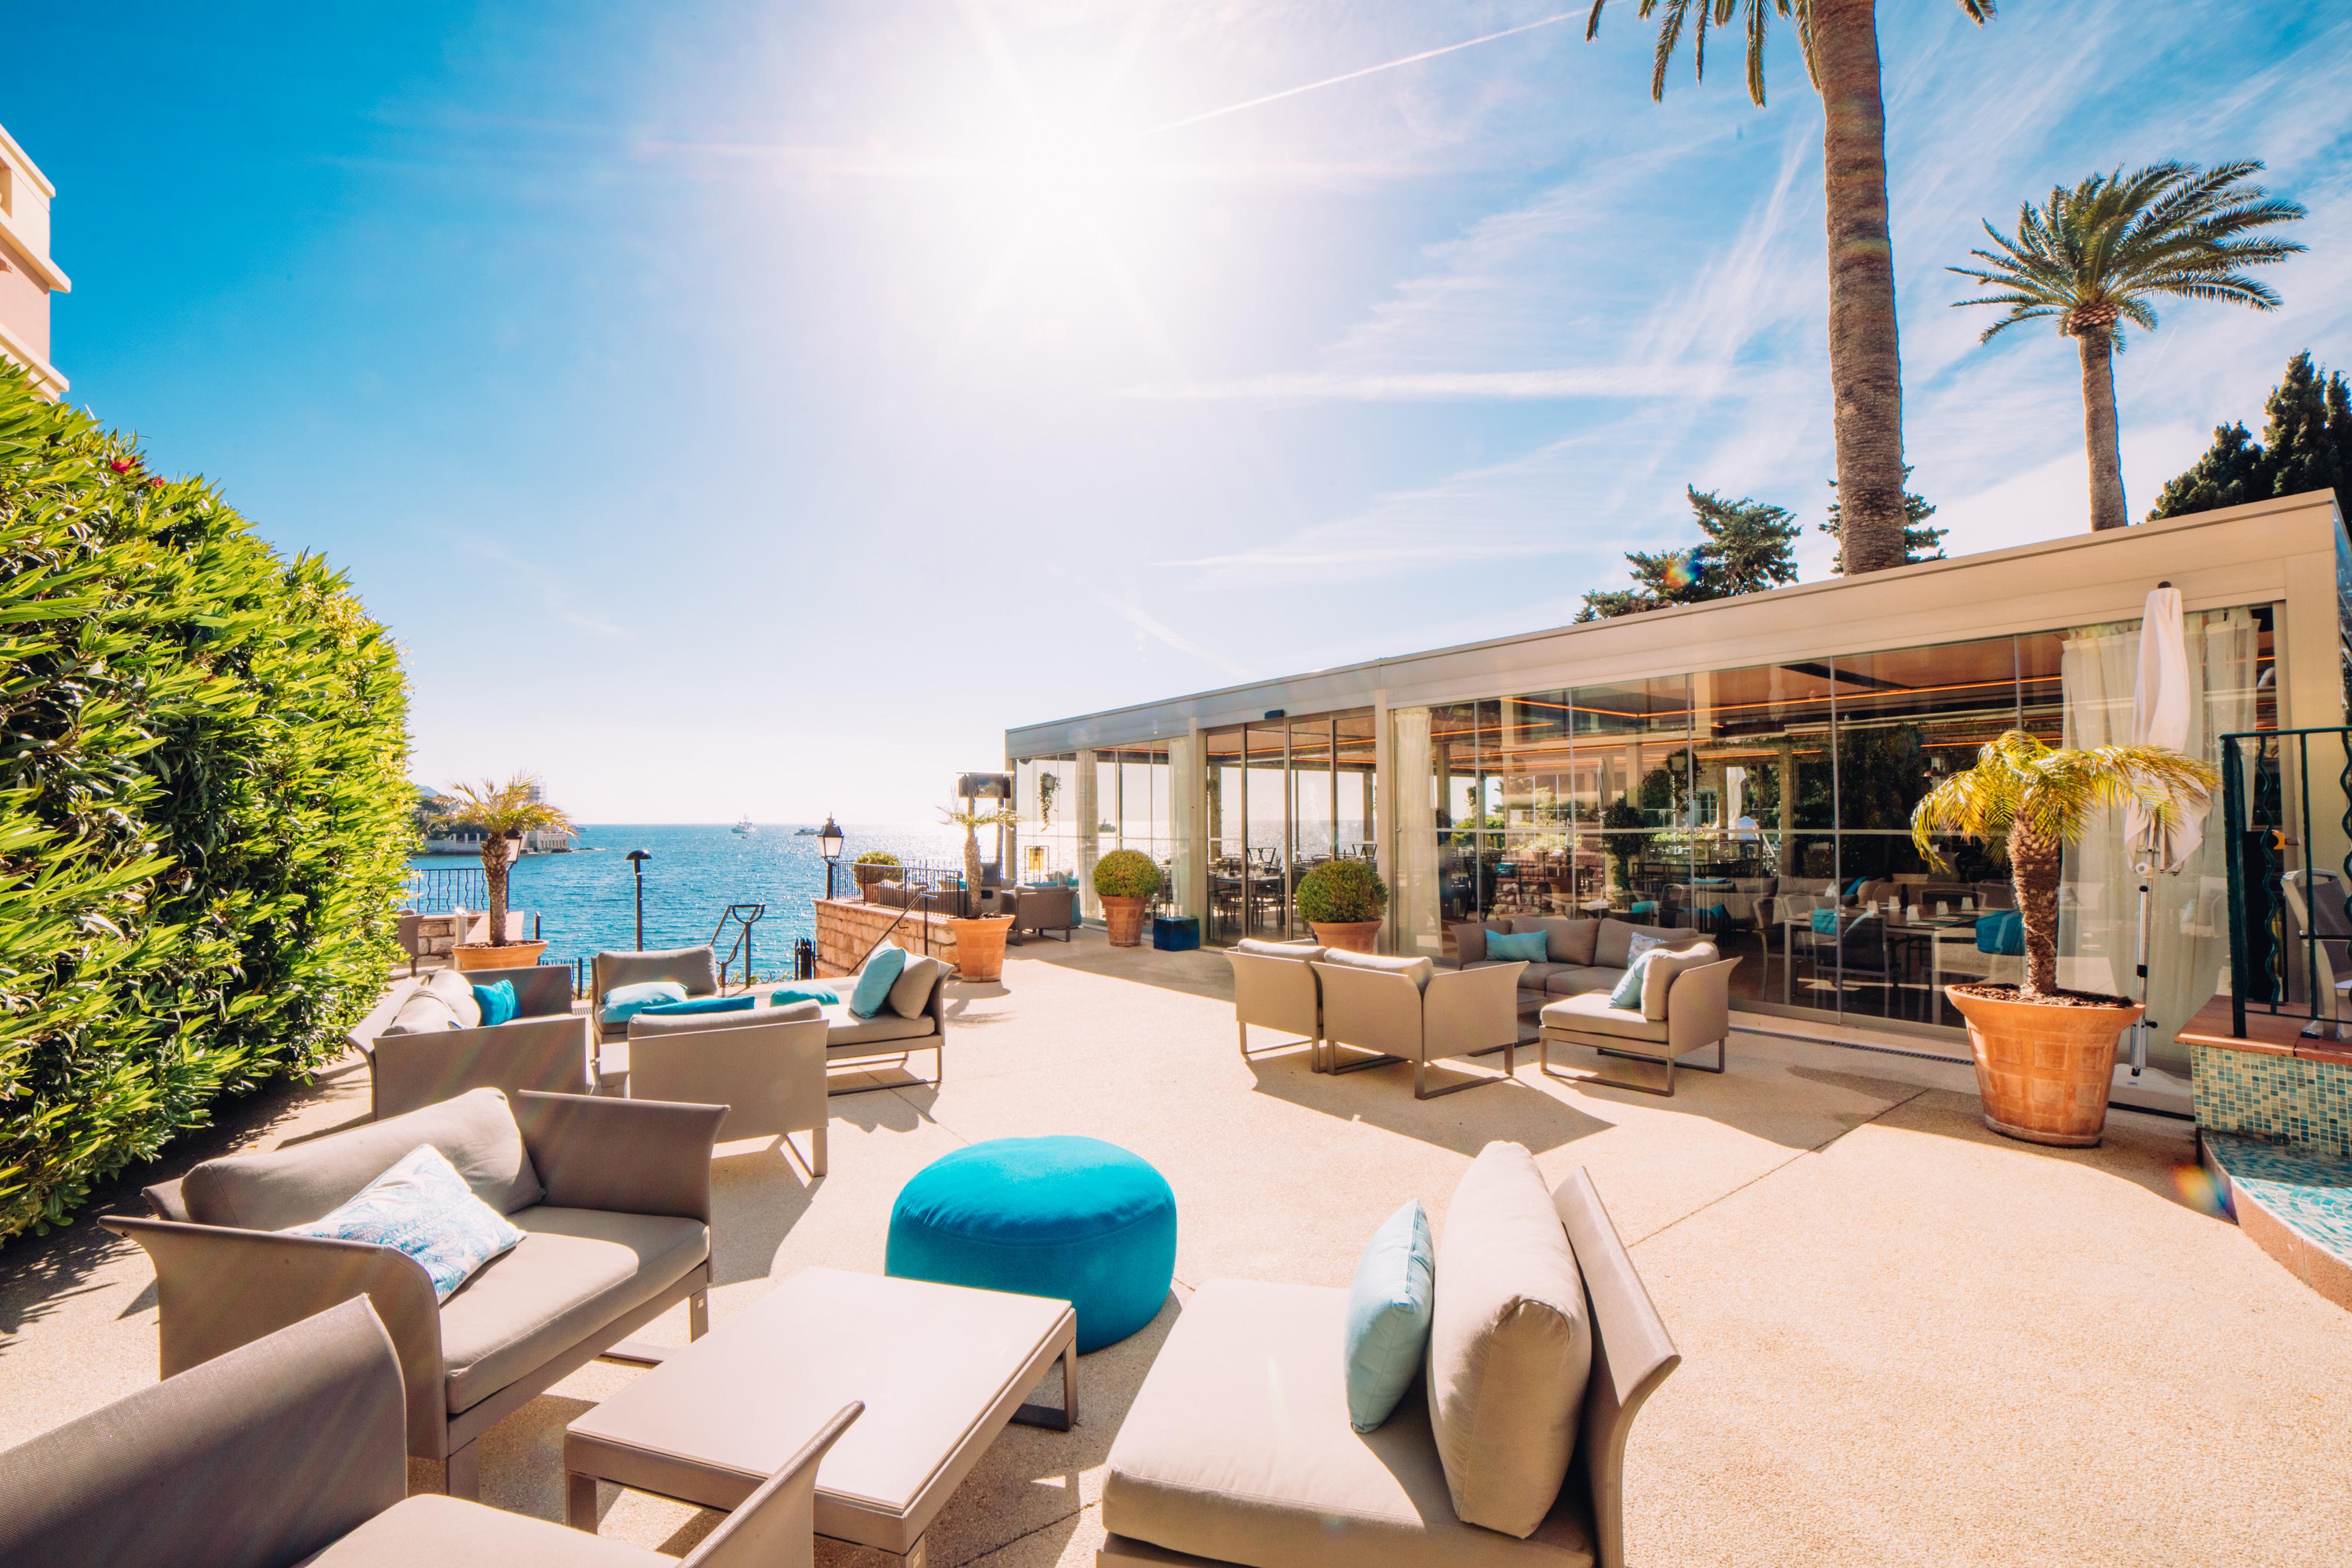 Restaurant Fran Ais H Tel Royal Riviera Restaurant La Table Du Royal Saint Jean Cap Ferrat